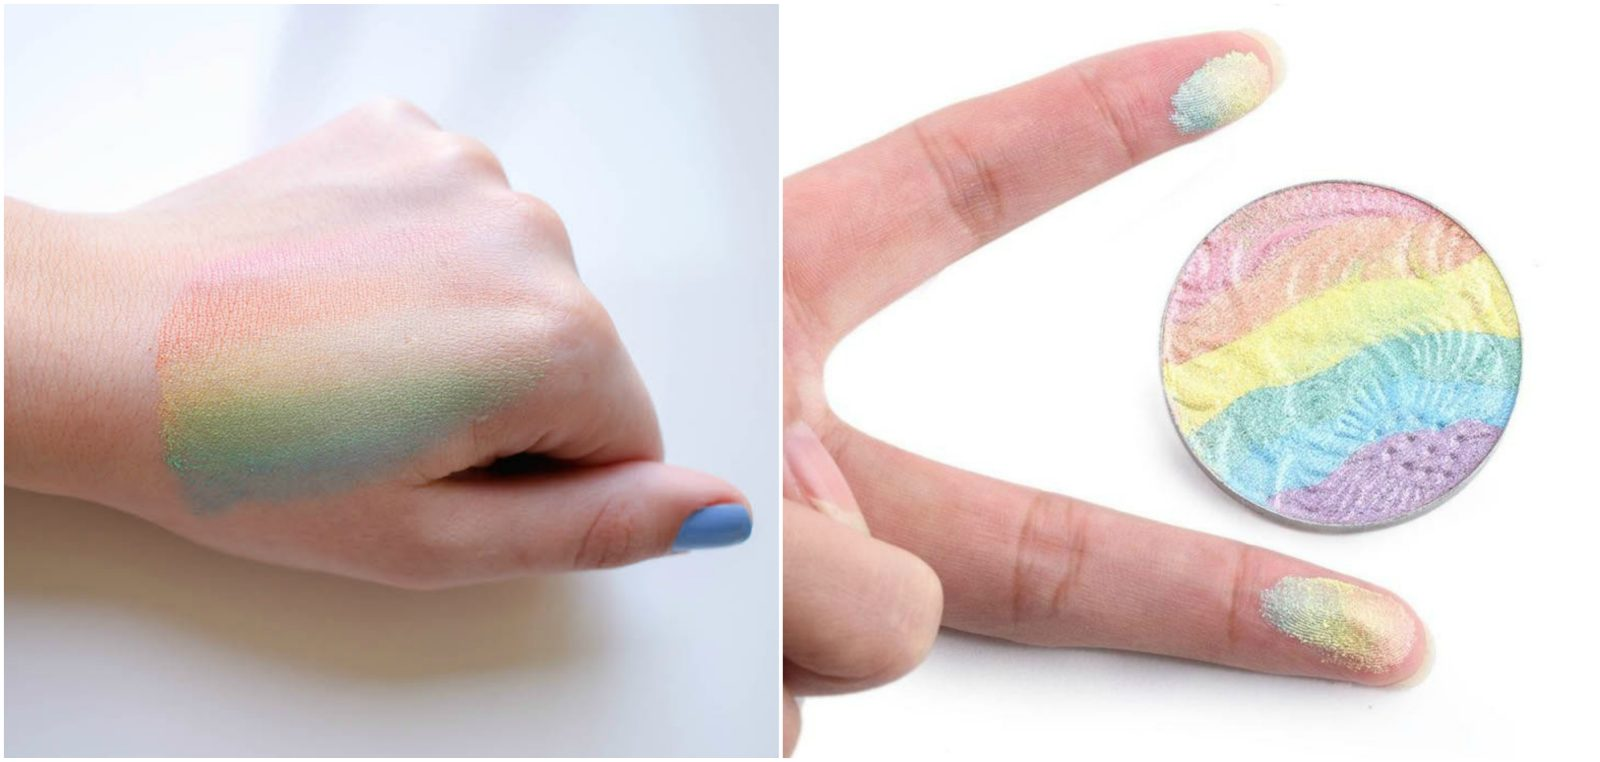 swatch phấn highlight cầu vồng PRISM